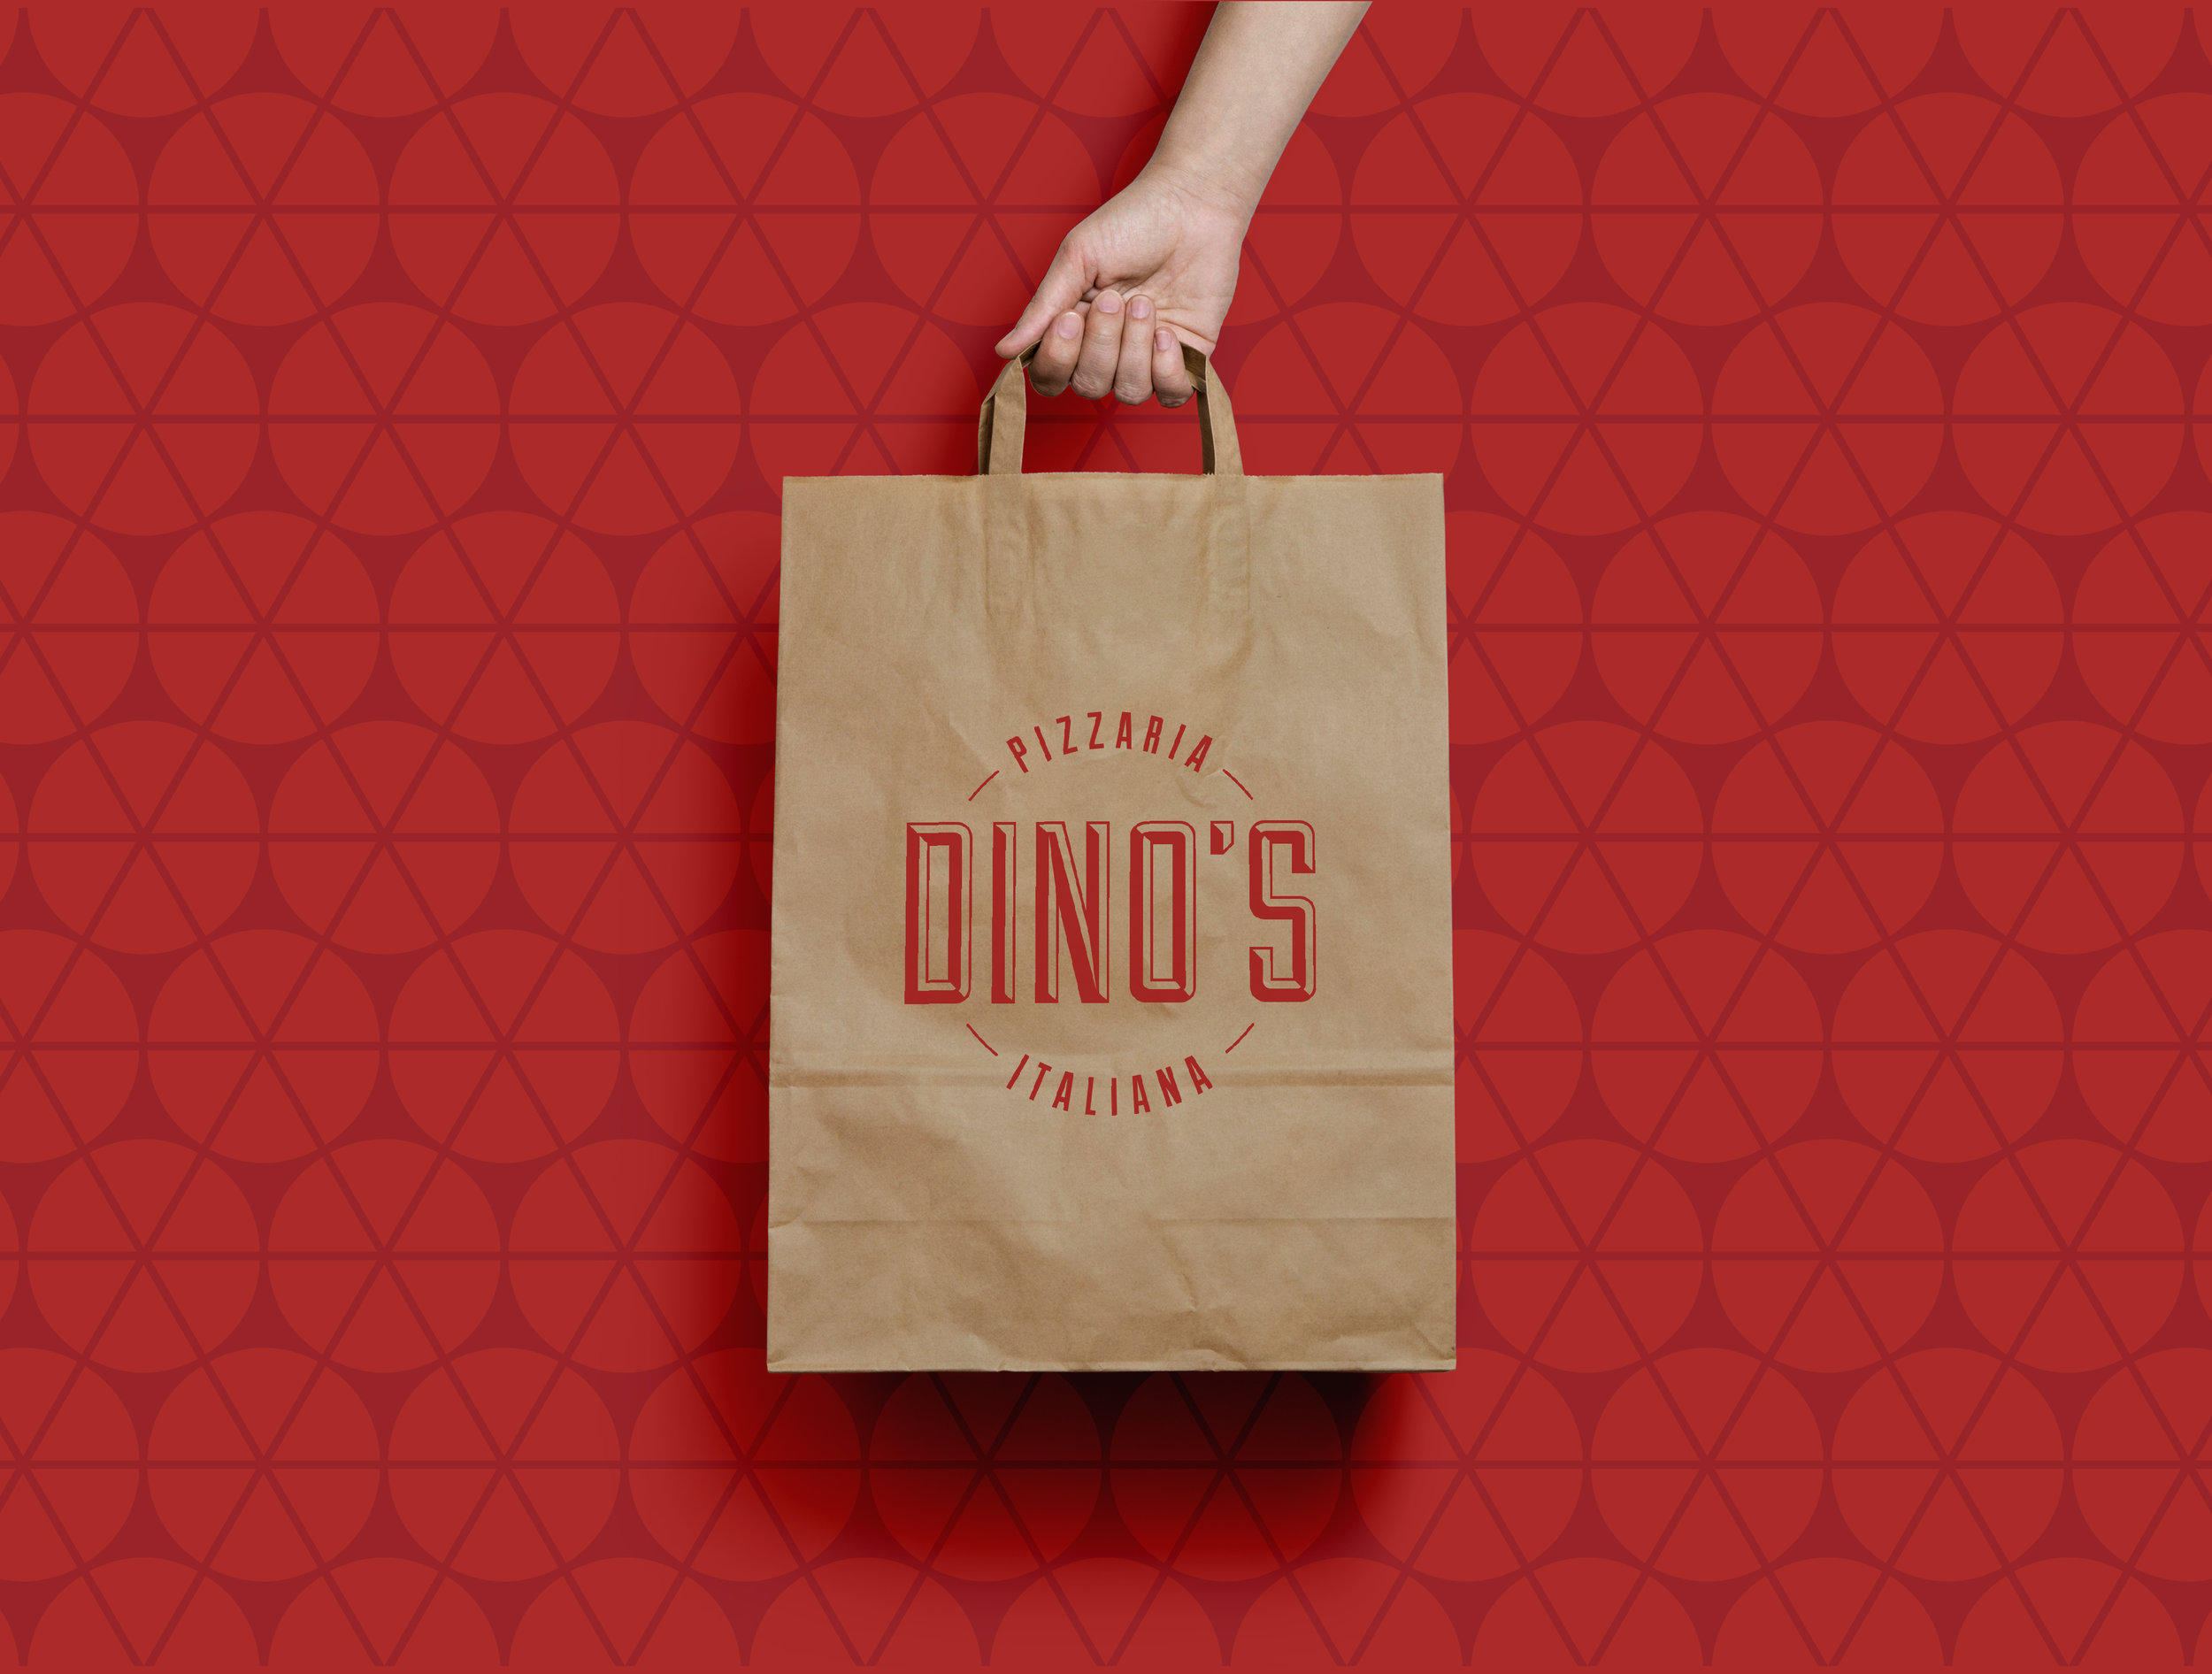 Dino's_bag.JPG